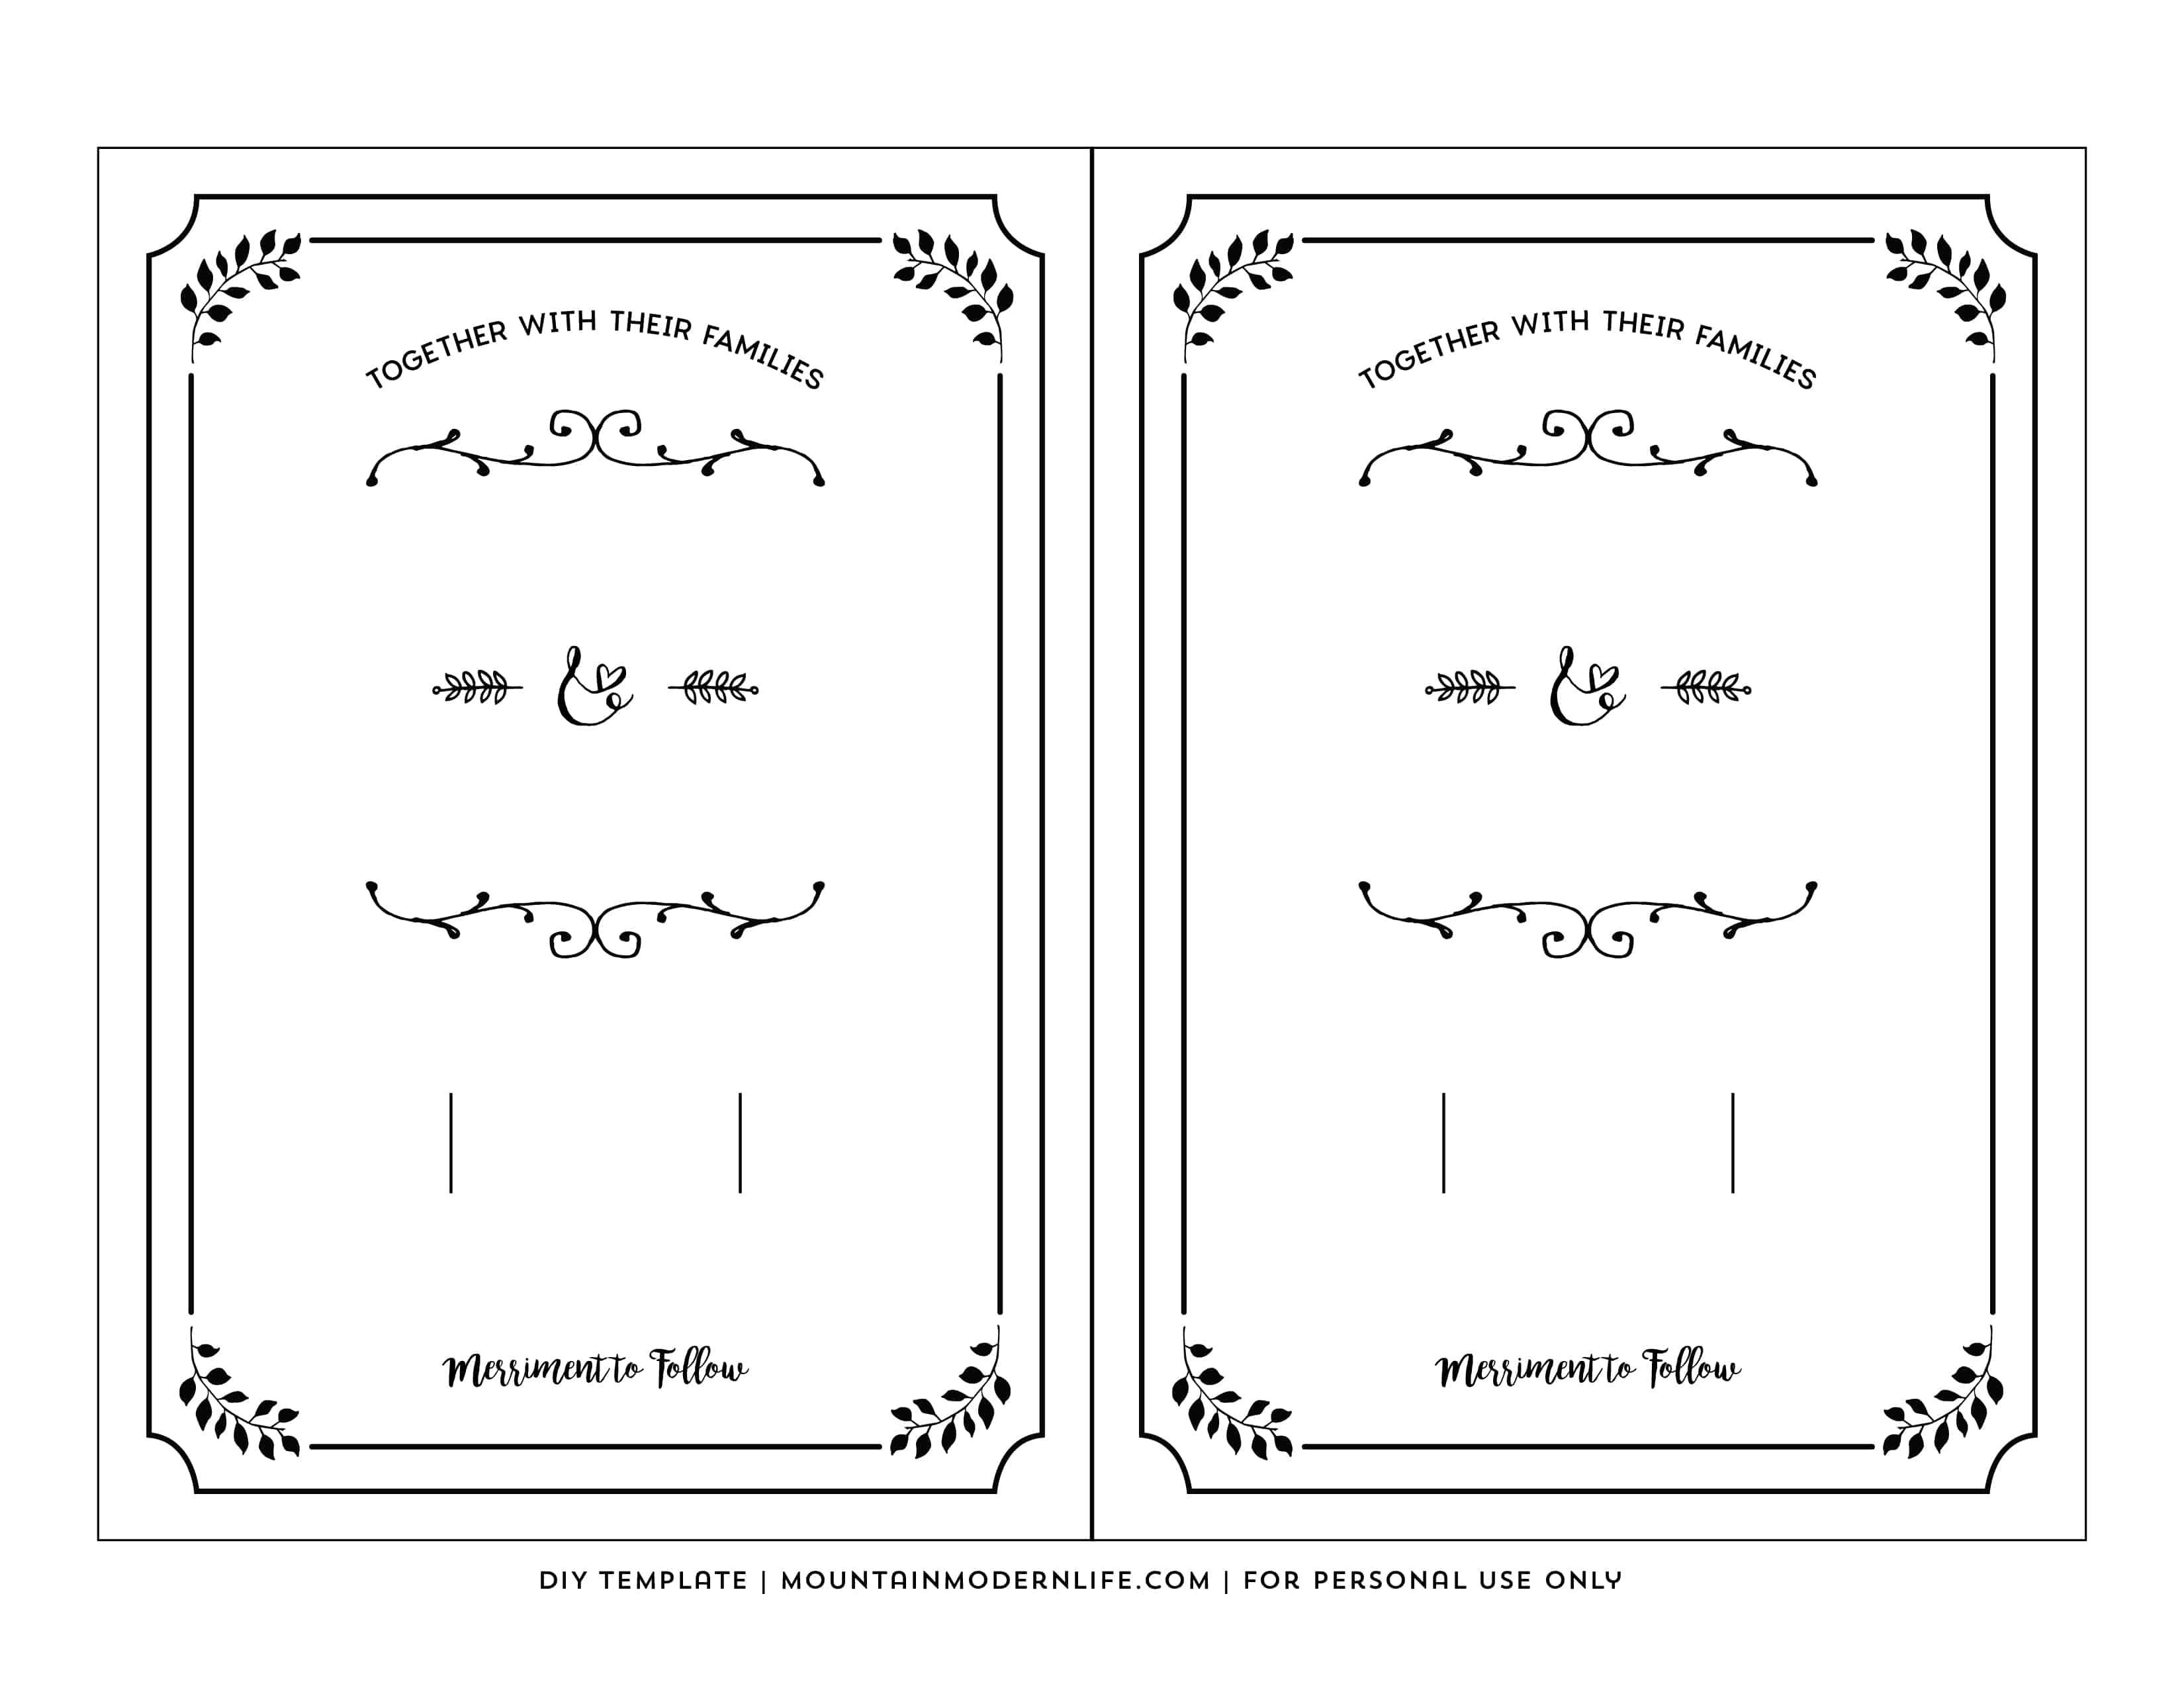 Free Printable Wedding Invitation Template - Printable Invitation Templates Free Download